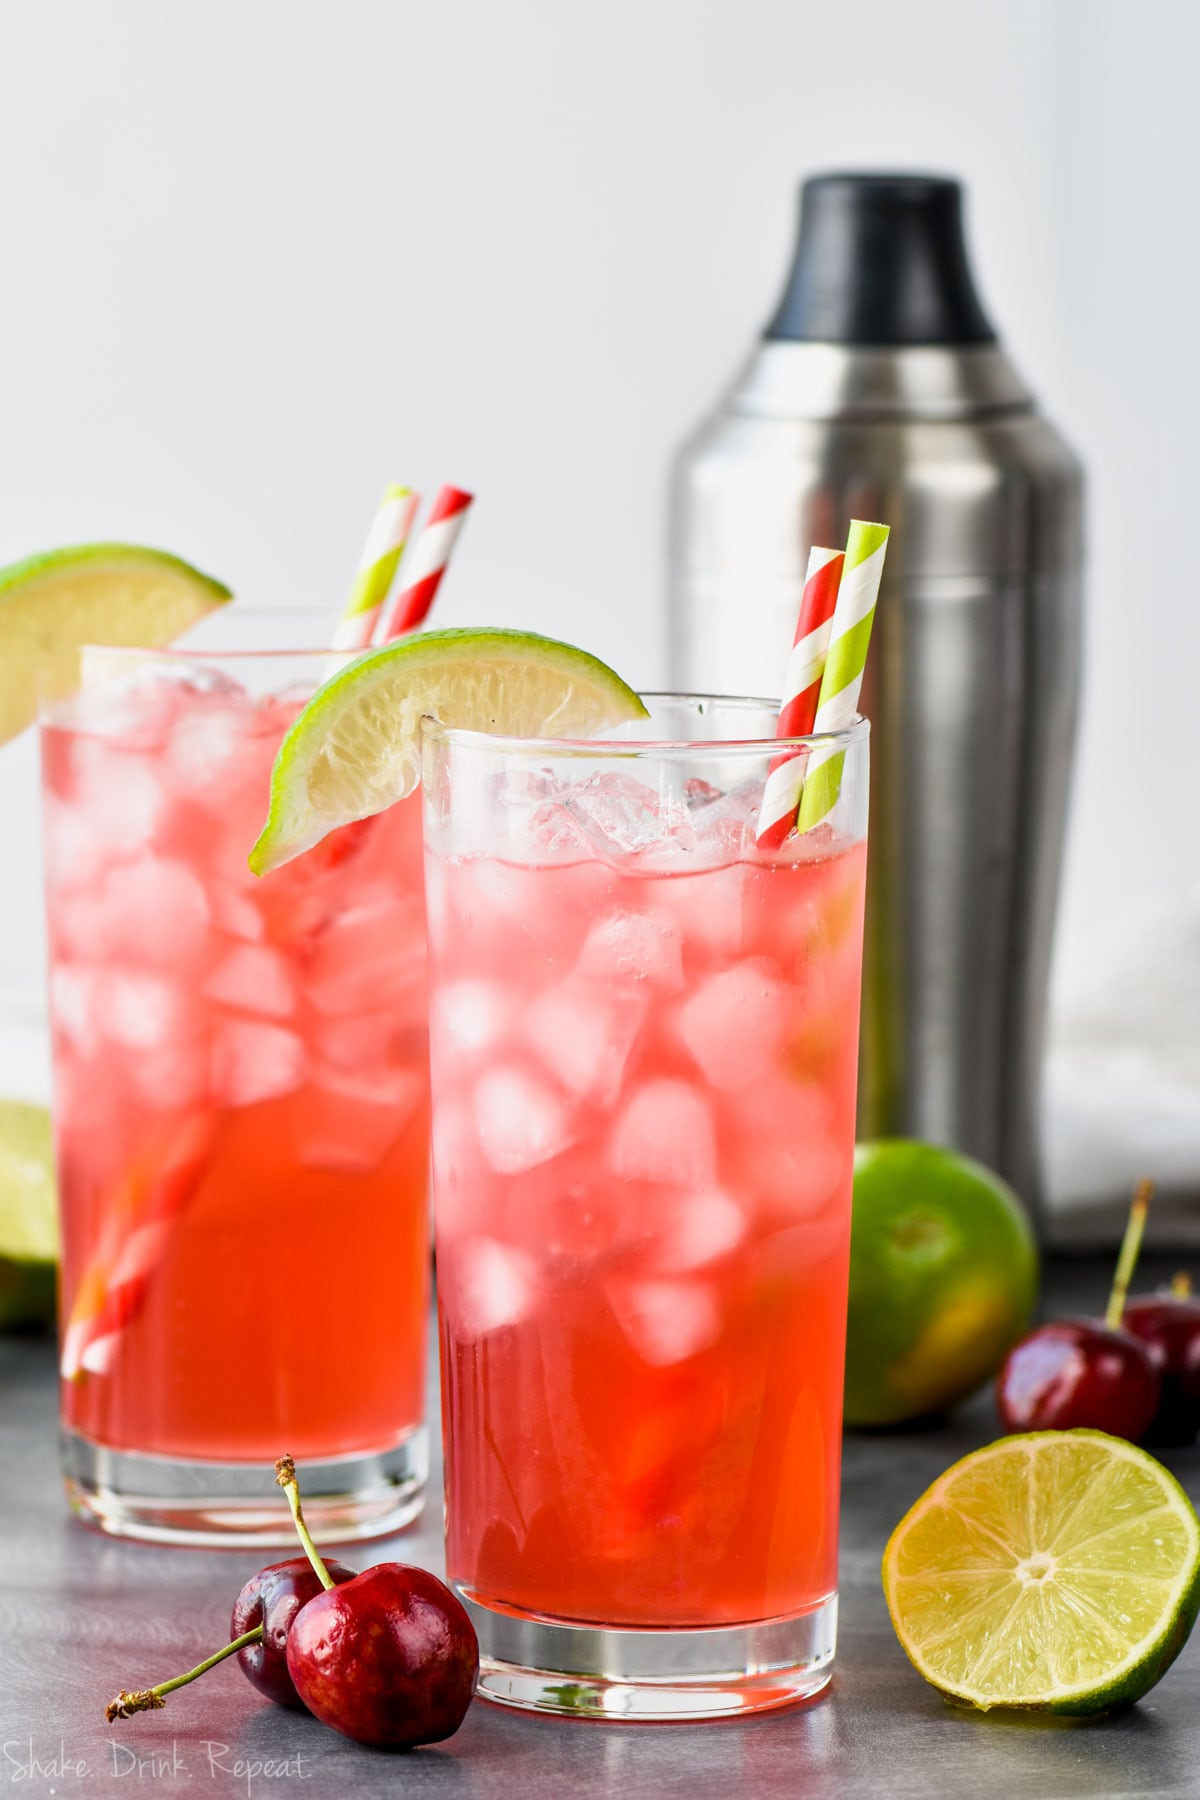 cherry_lime_vodka_tonic_recipe_image - Shake Drink Repeat